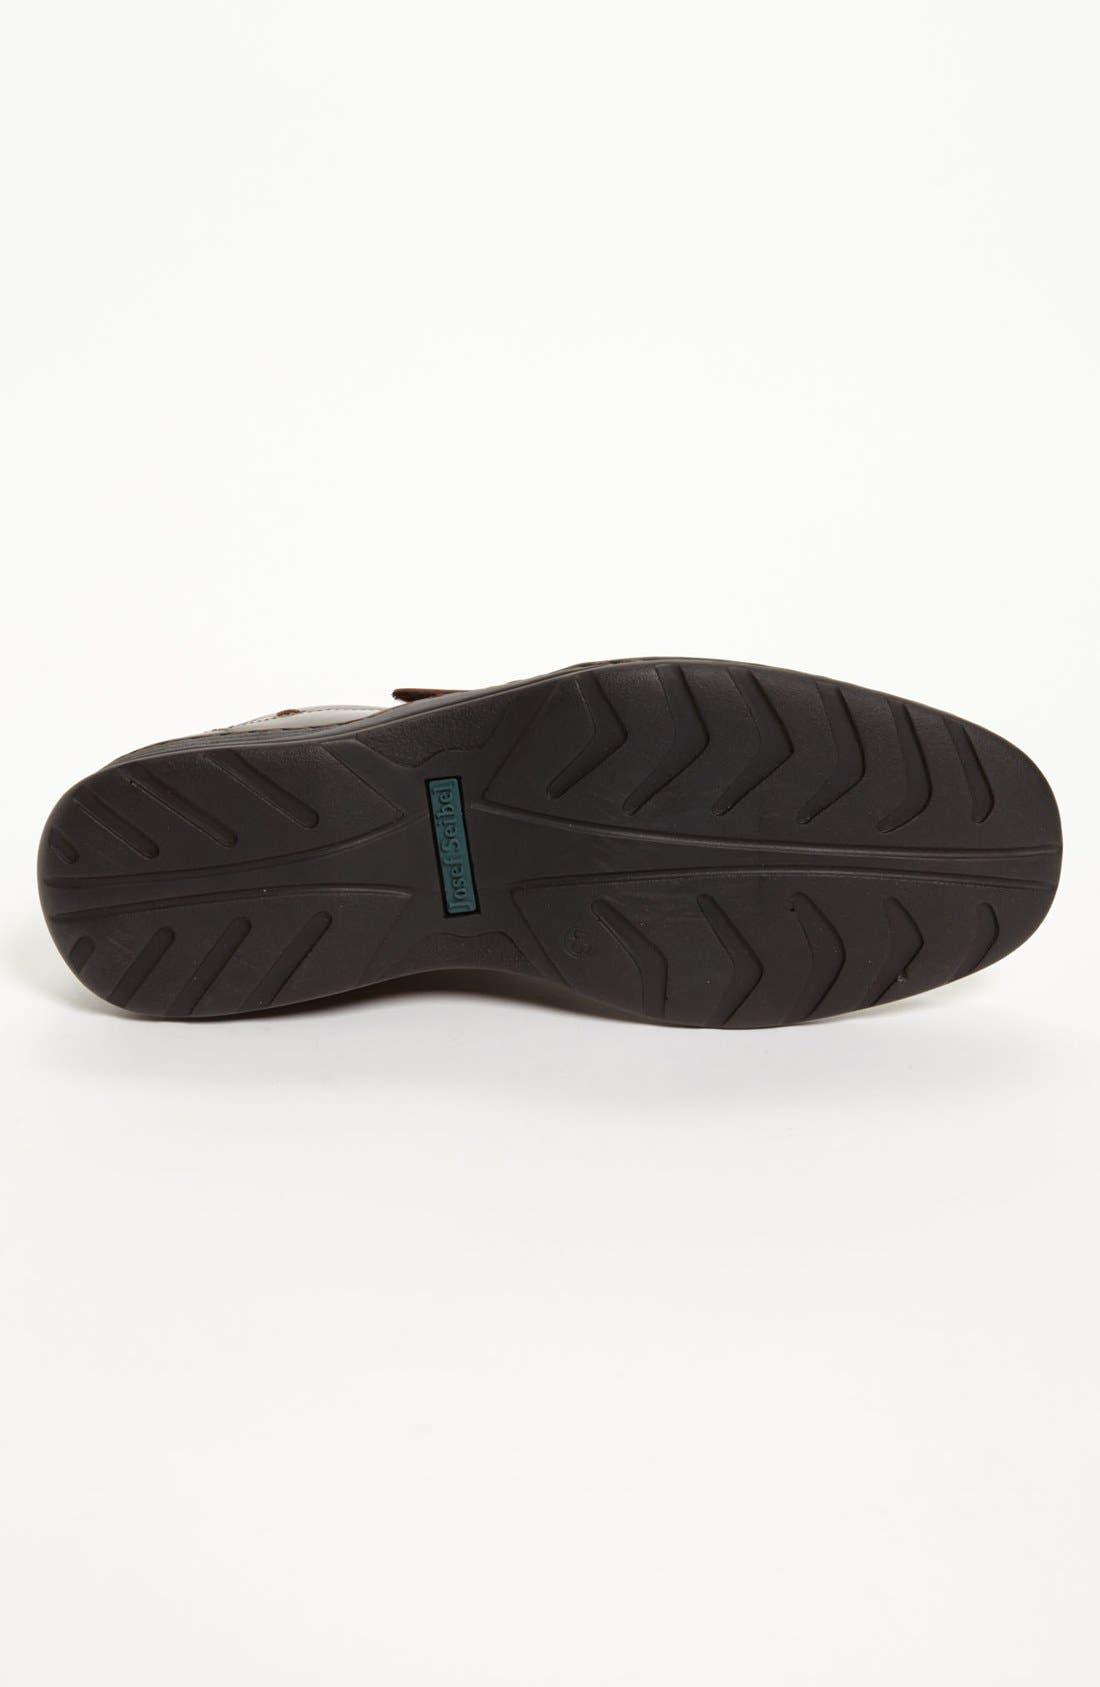 'Lionel 06' Sandal,                             Alternate thumbnail 4, color,                             Brown/ Brown Leather